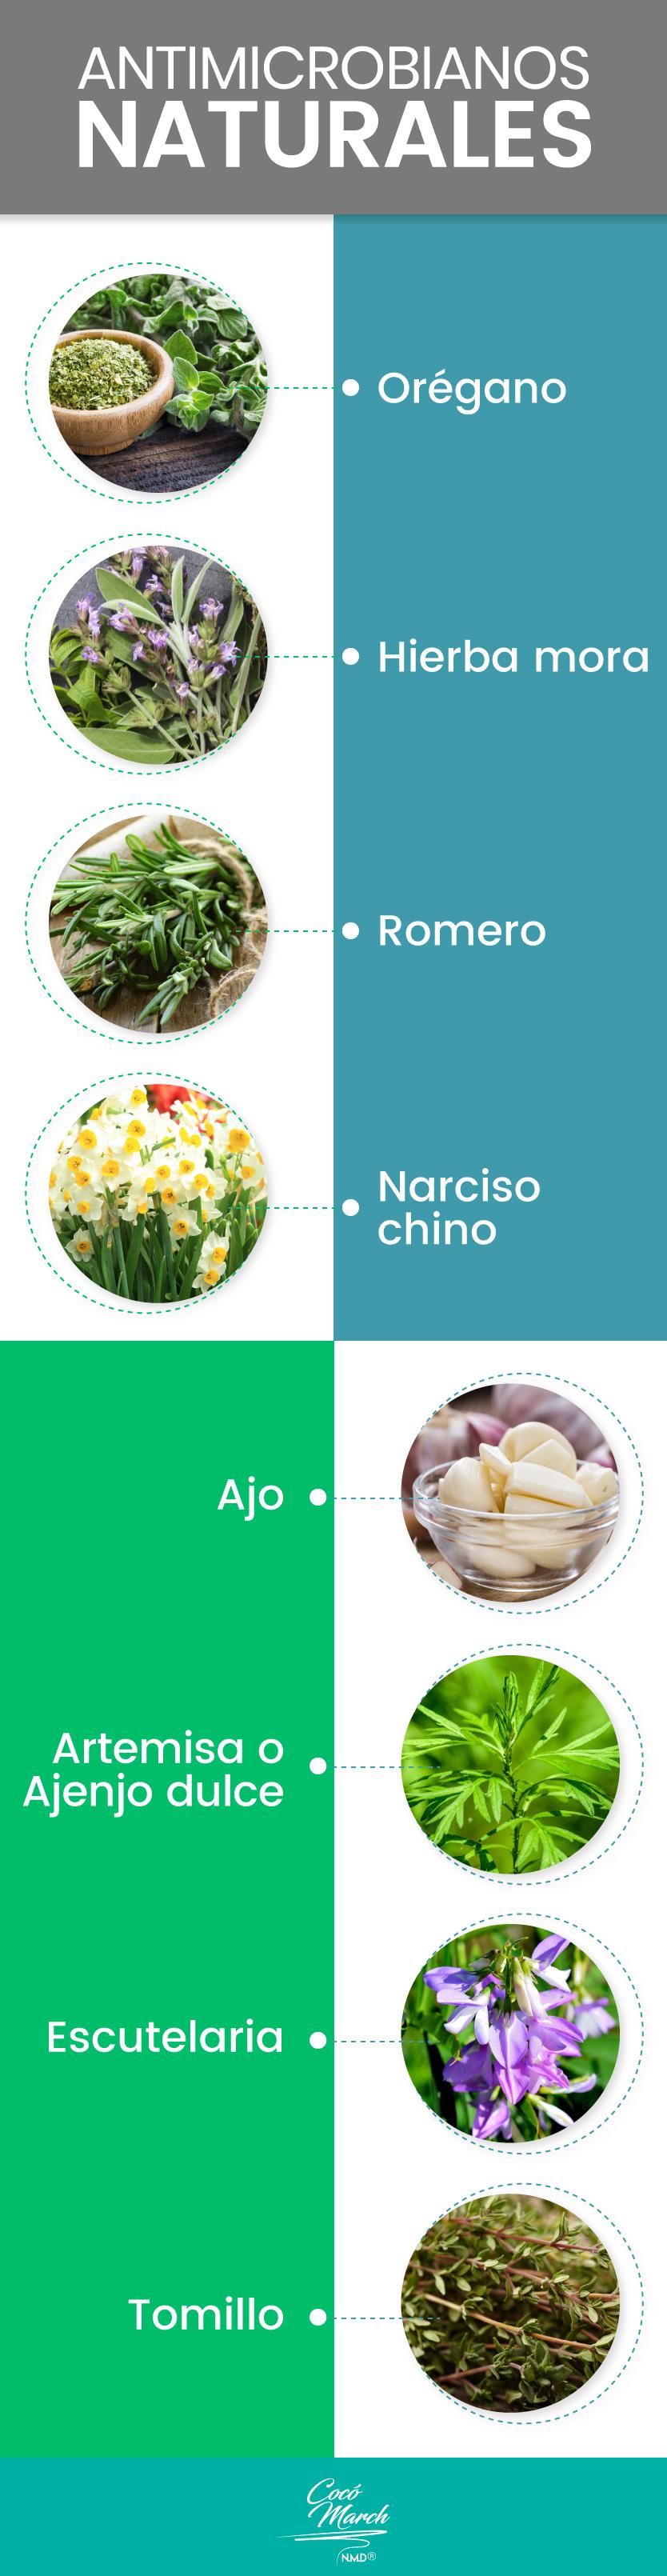 antimicrobianos naturales